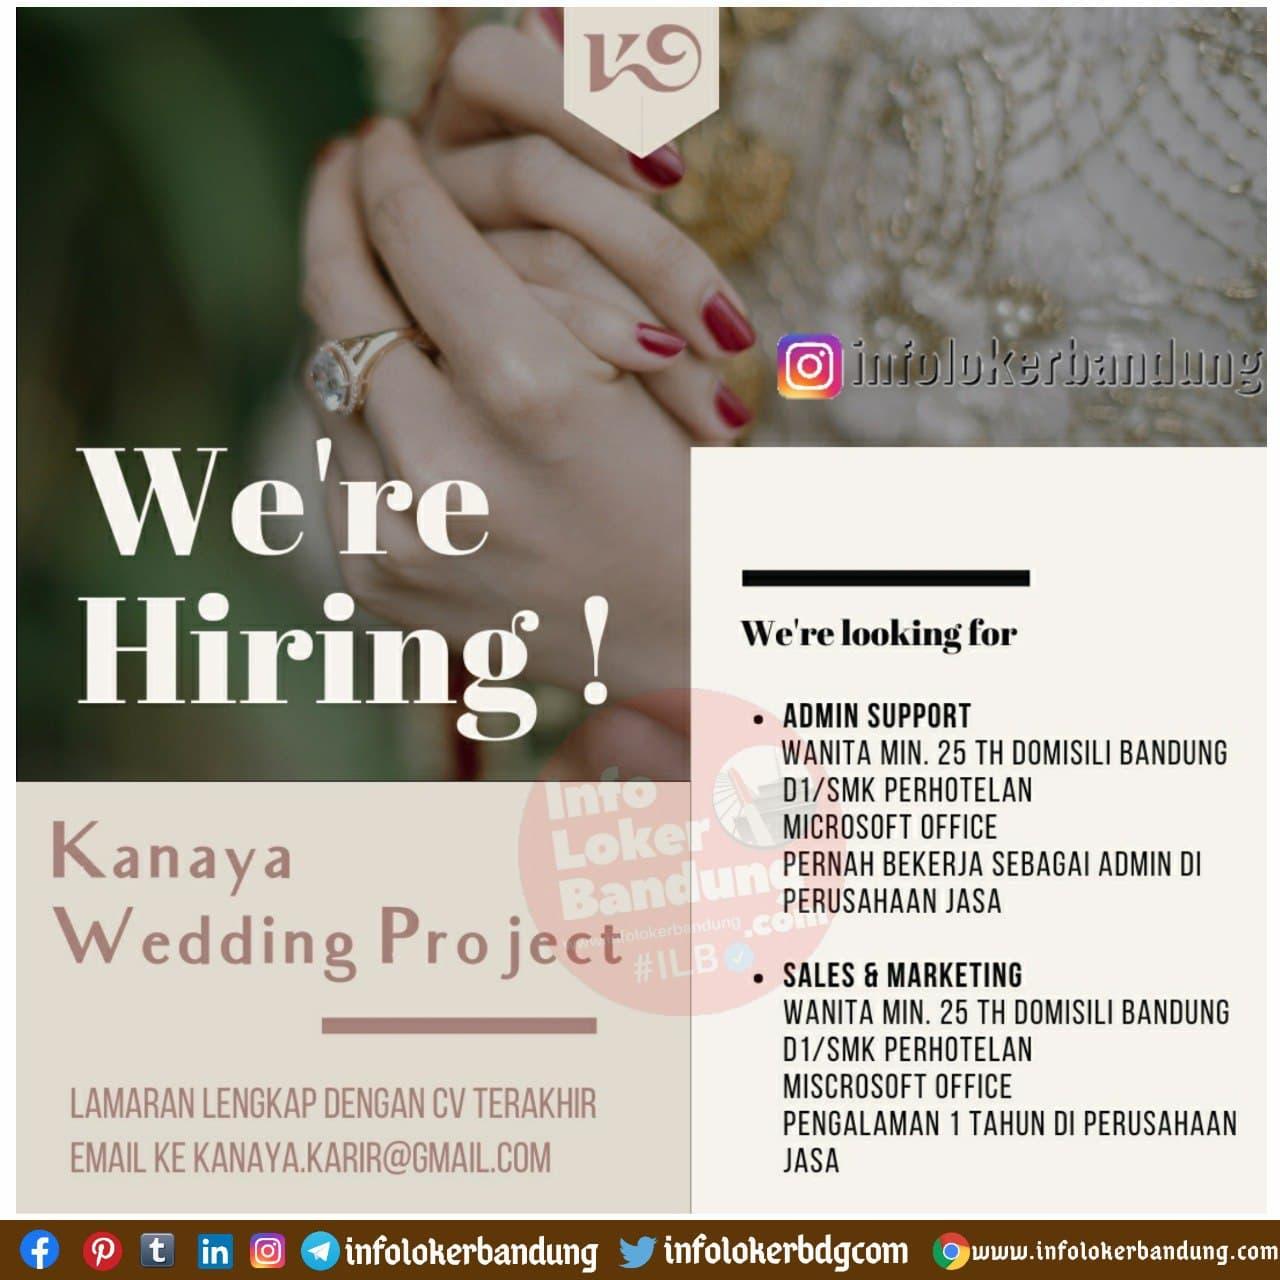 Lowongan Kerja Kanya Wedding Project Bandung Desember 2020